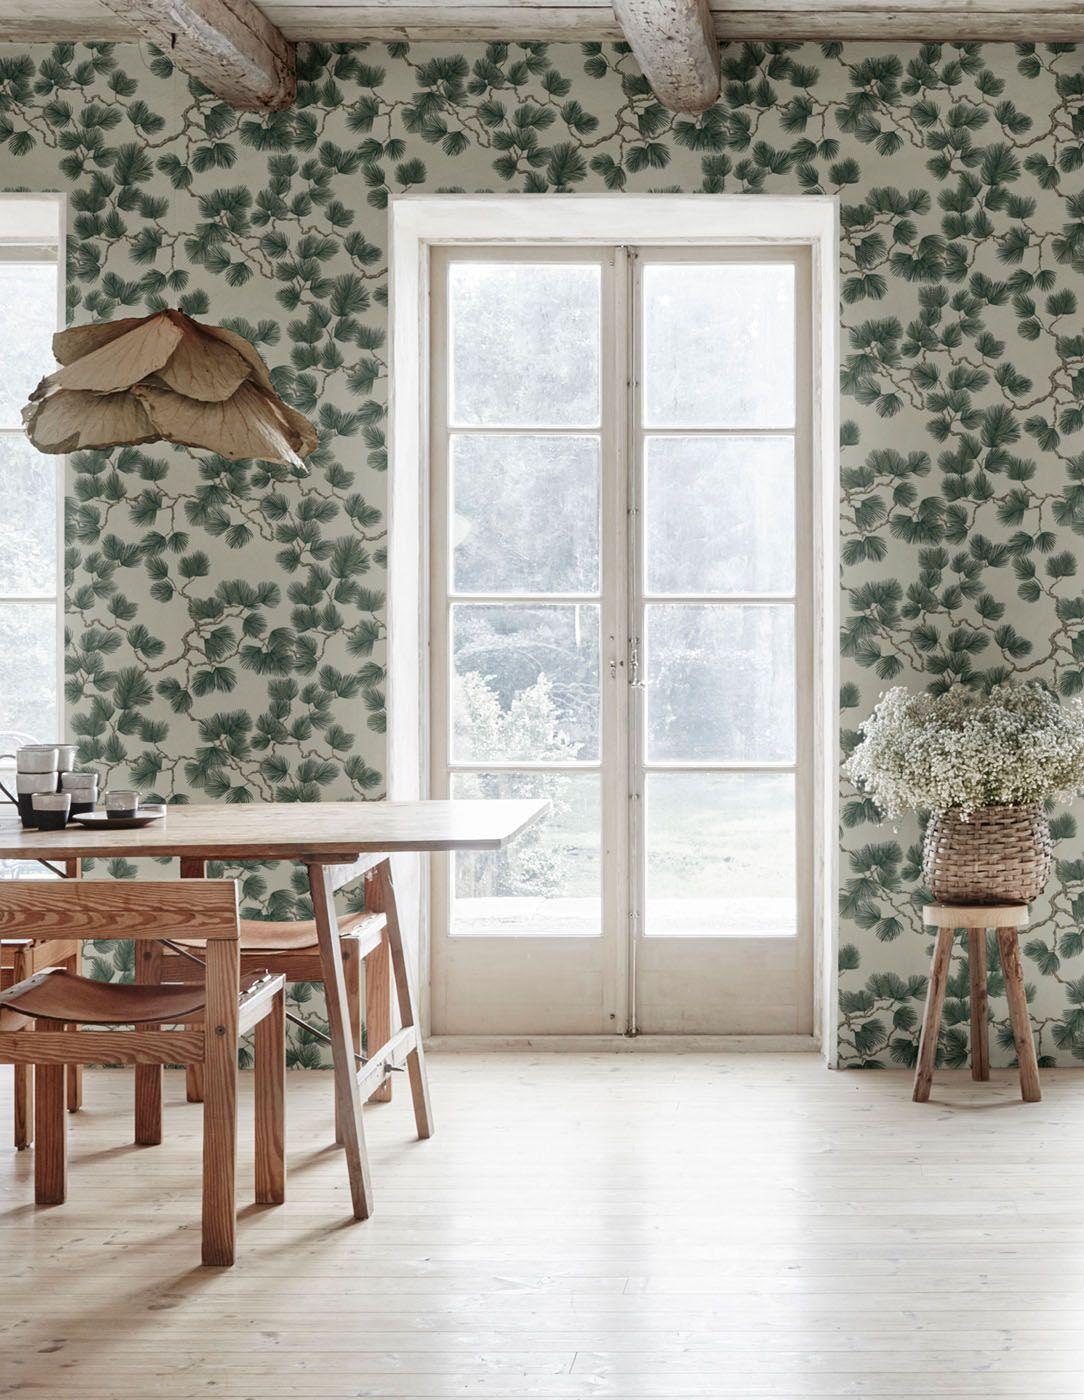 Pine Green In 2020 Green Wallpaper Bathroom Wallpaper Trends